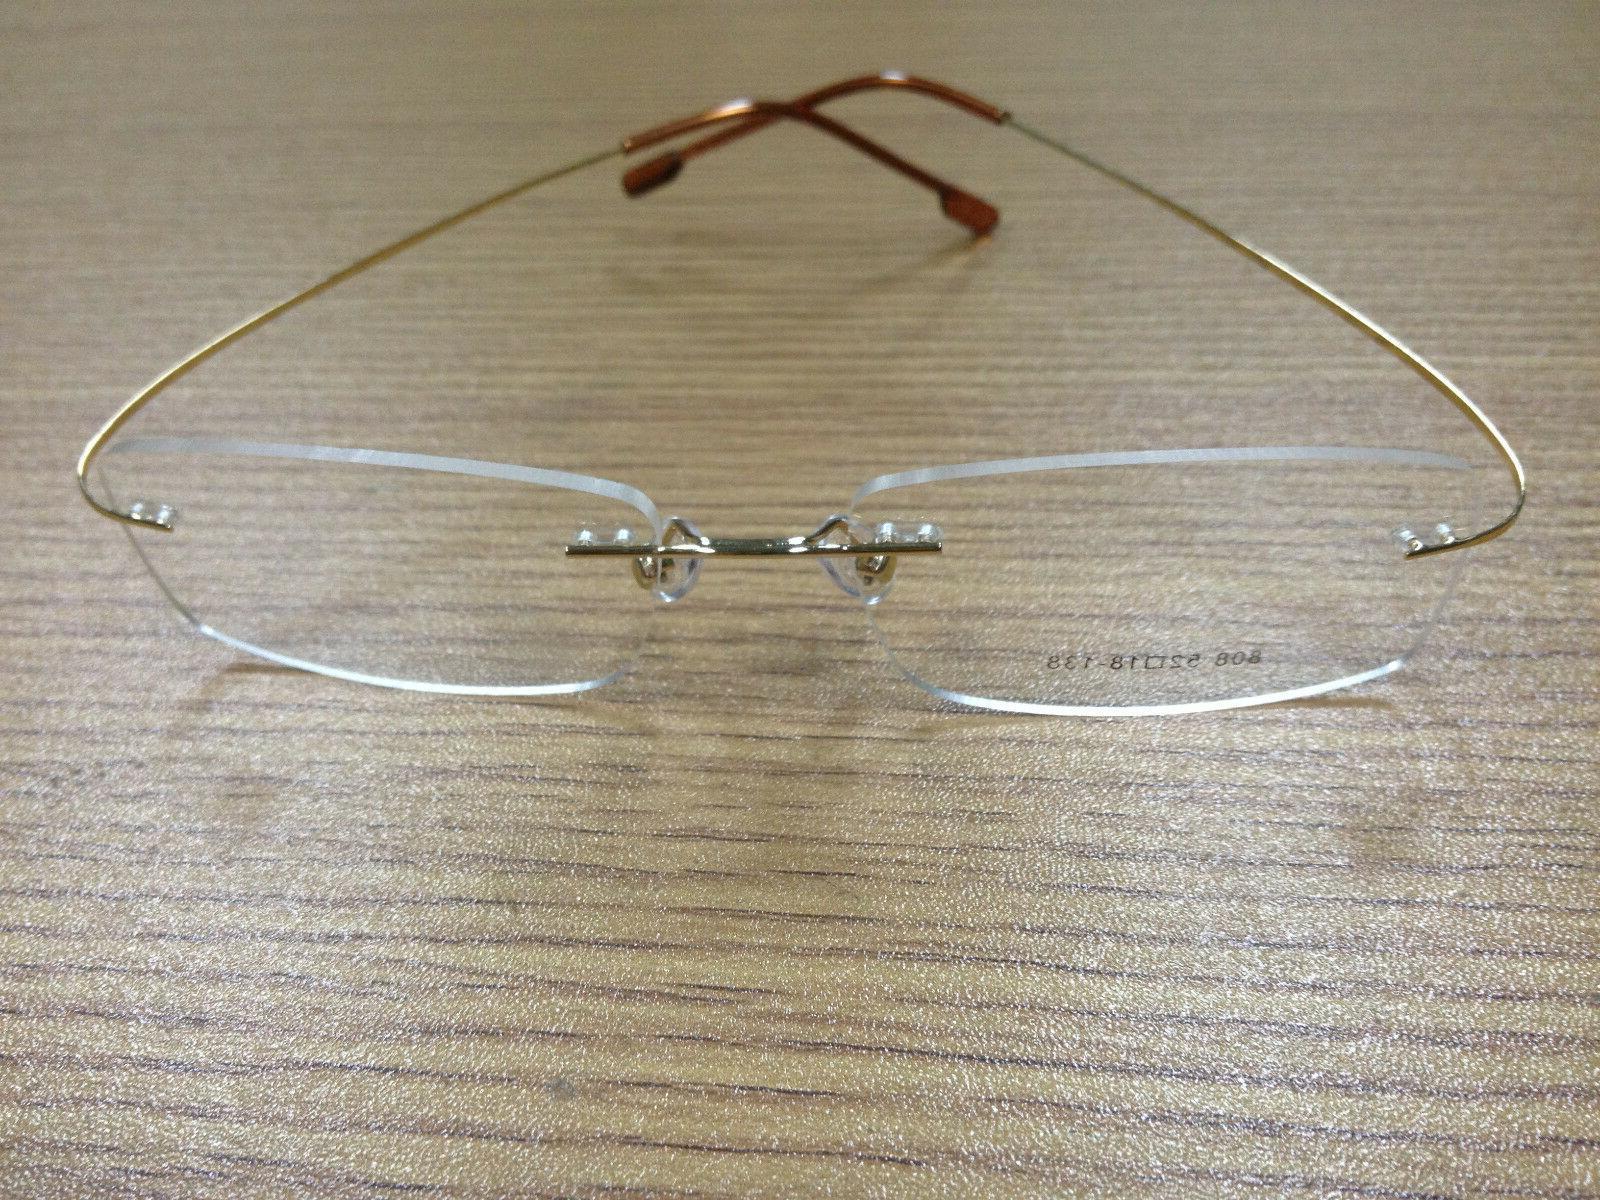 Rimless titanium unisex prescription eyeglass frames! Lightweight/flexible